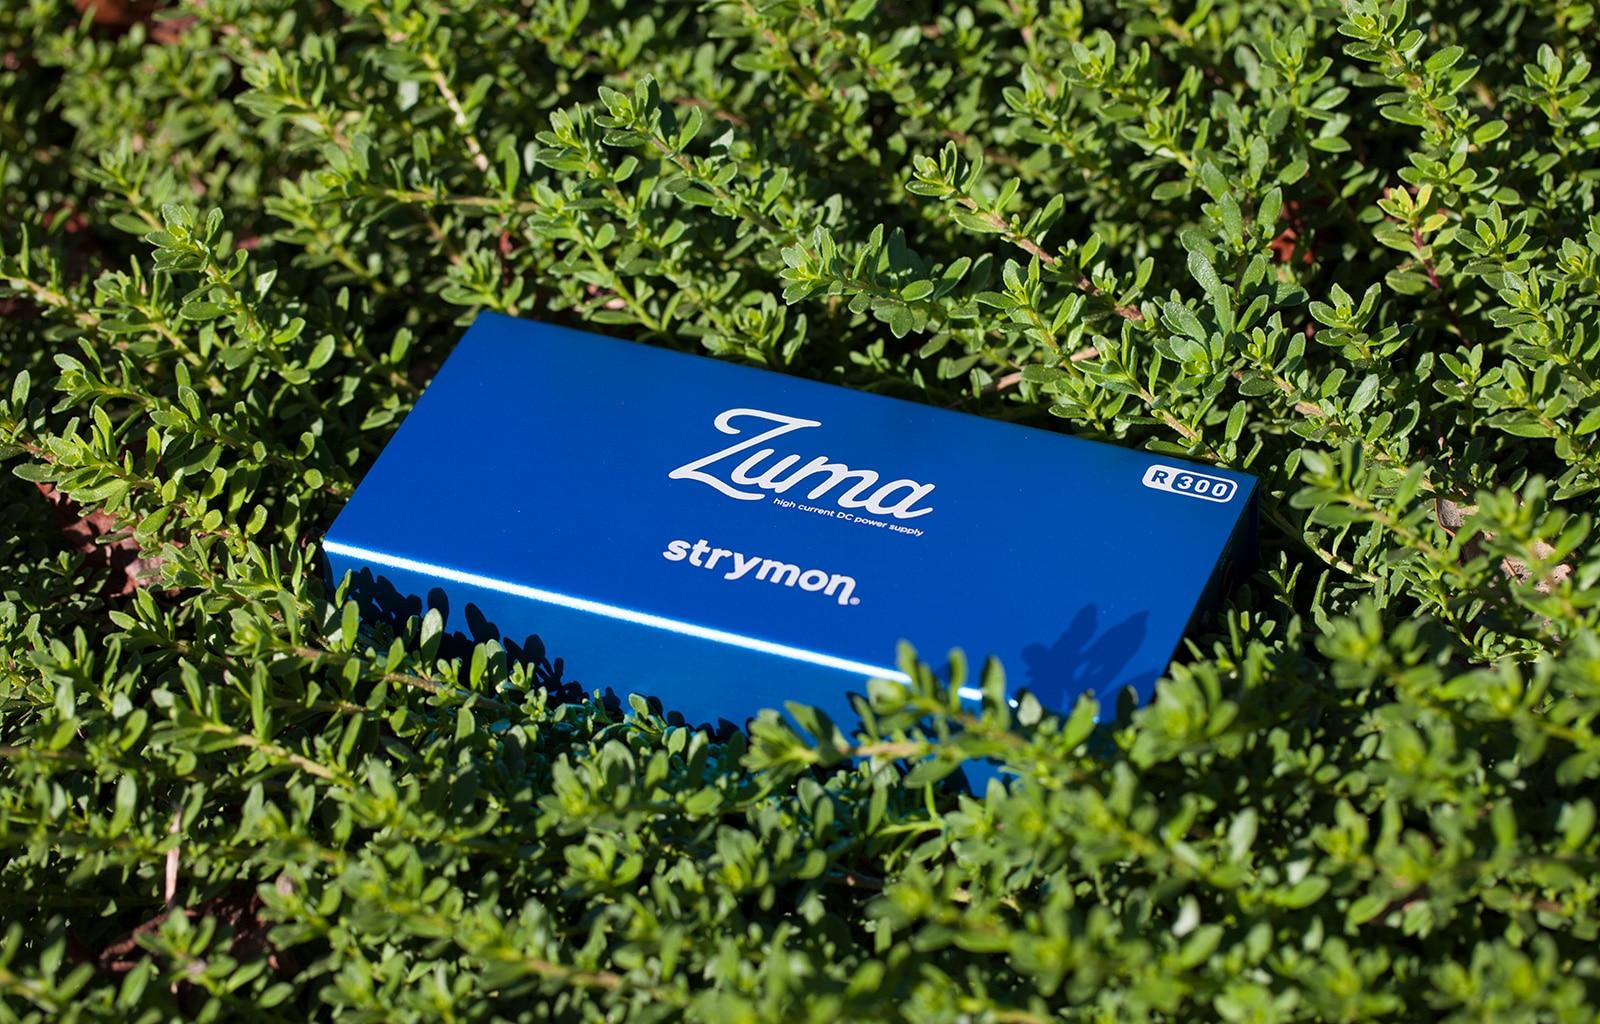 Strymon Zuma R300 pedal power supply